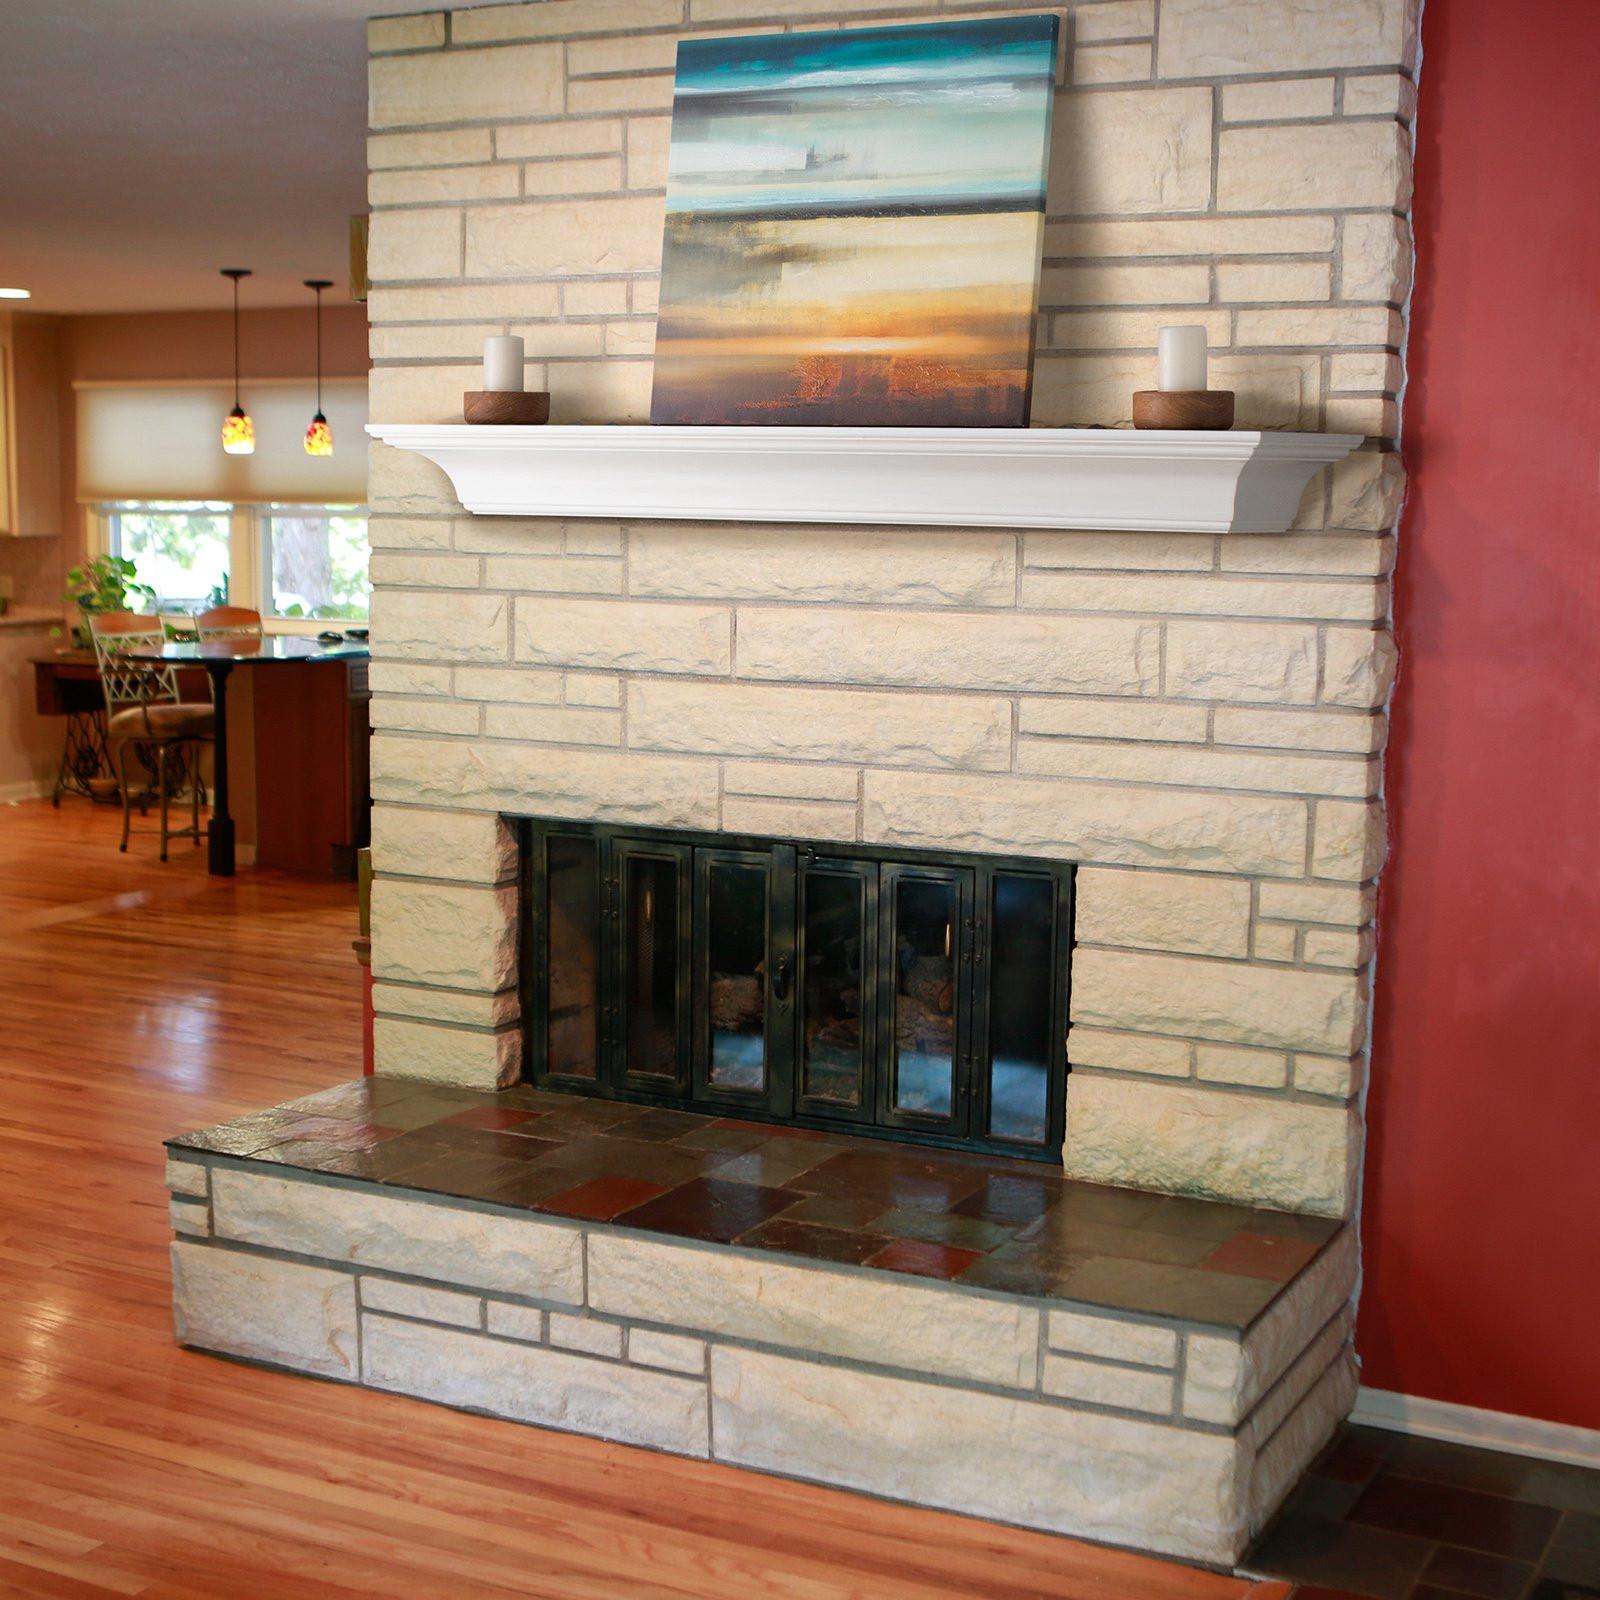 Best ideas about Fireplace Mantel Shelf . Save or Pin Belham Living Palmer Fireplace Mantel Shelf Fireplace Now.